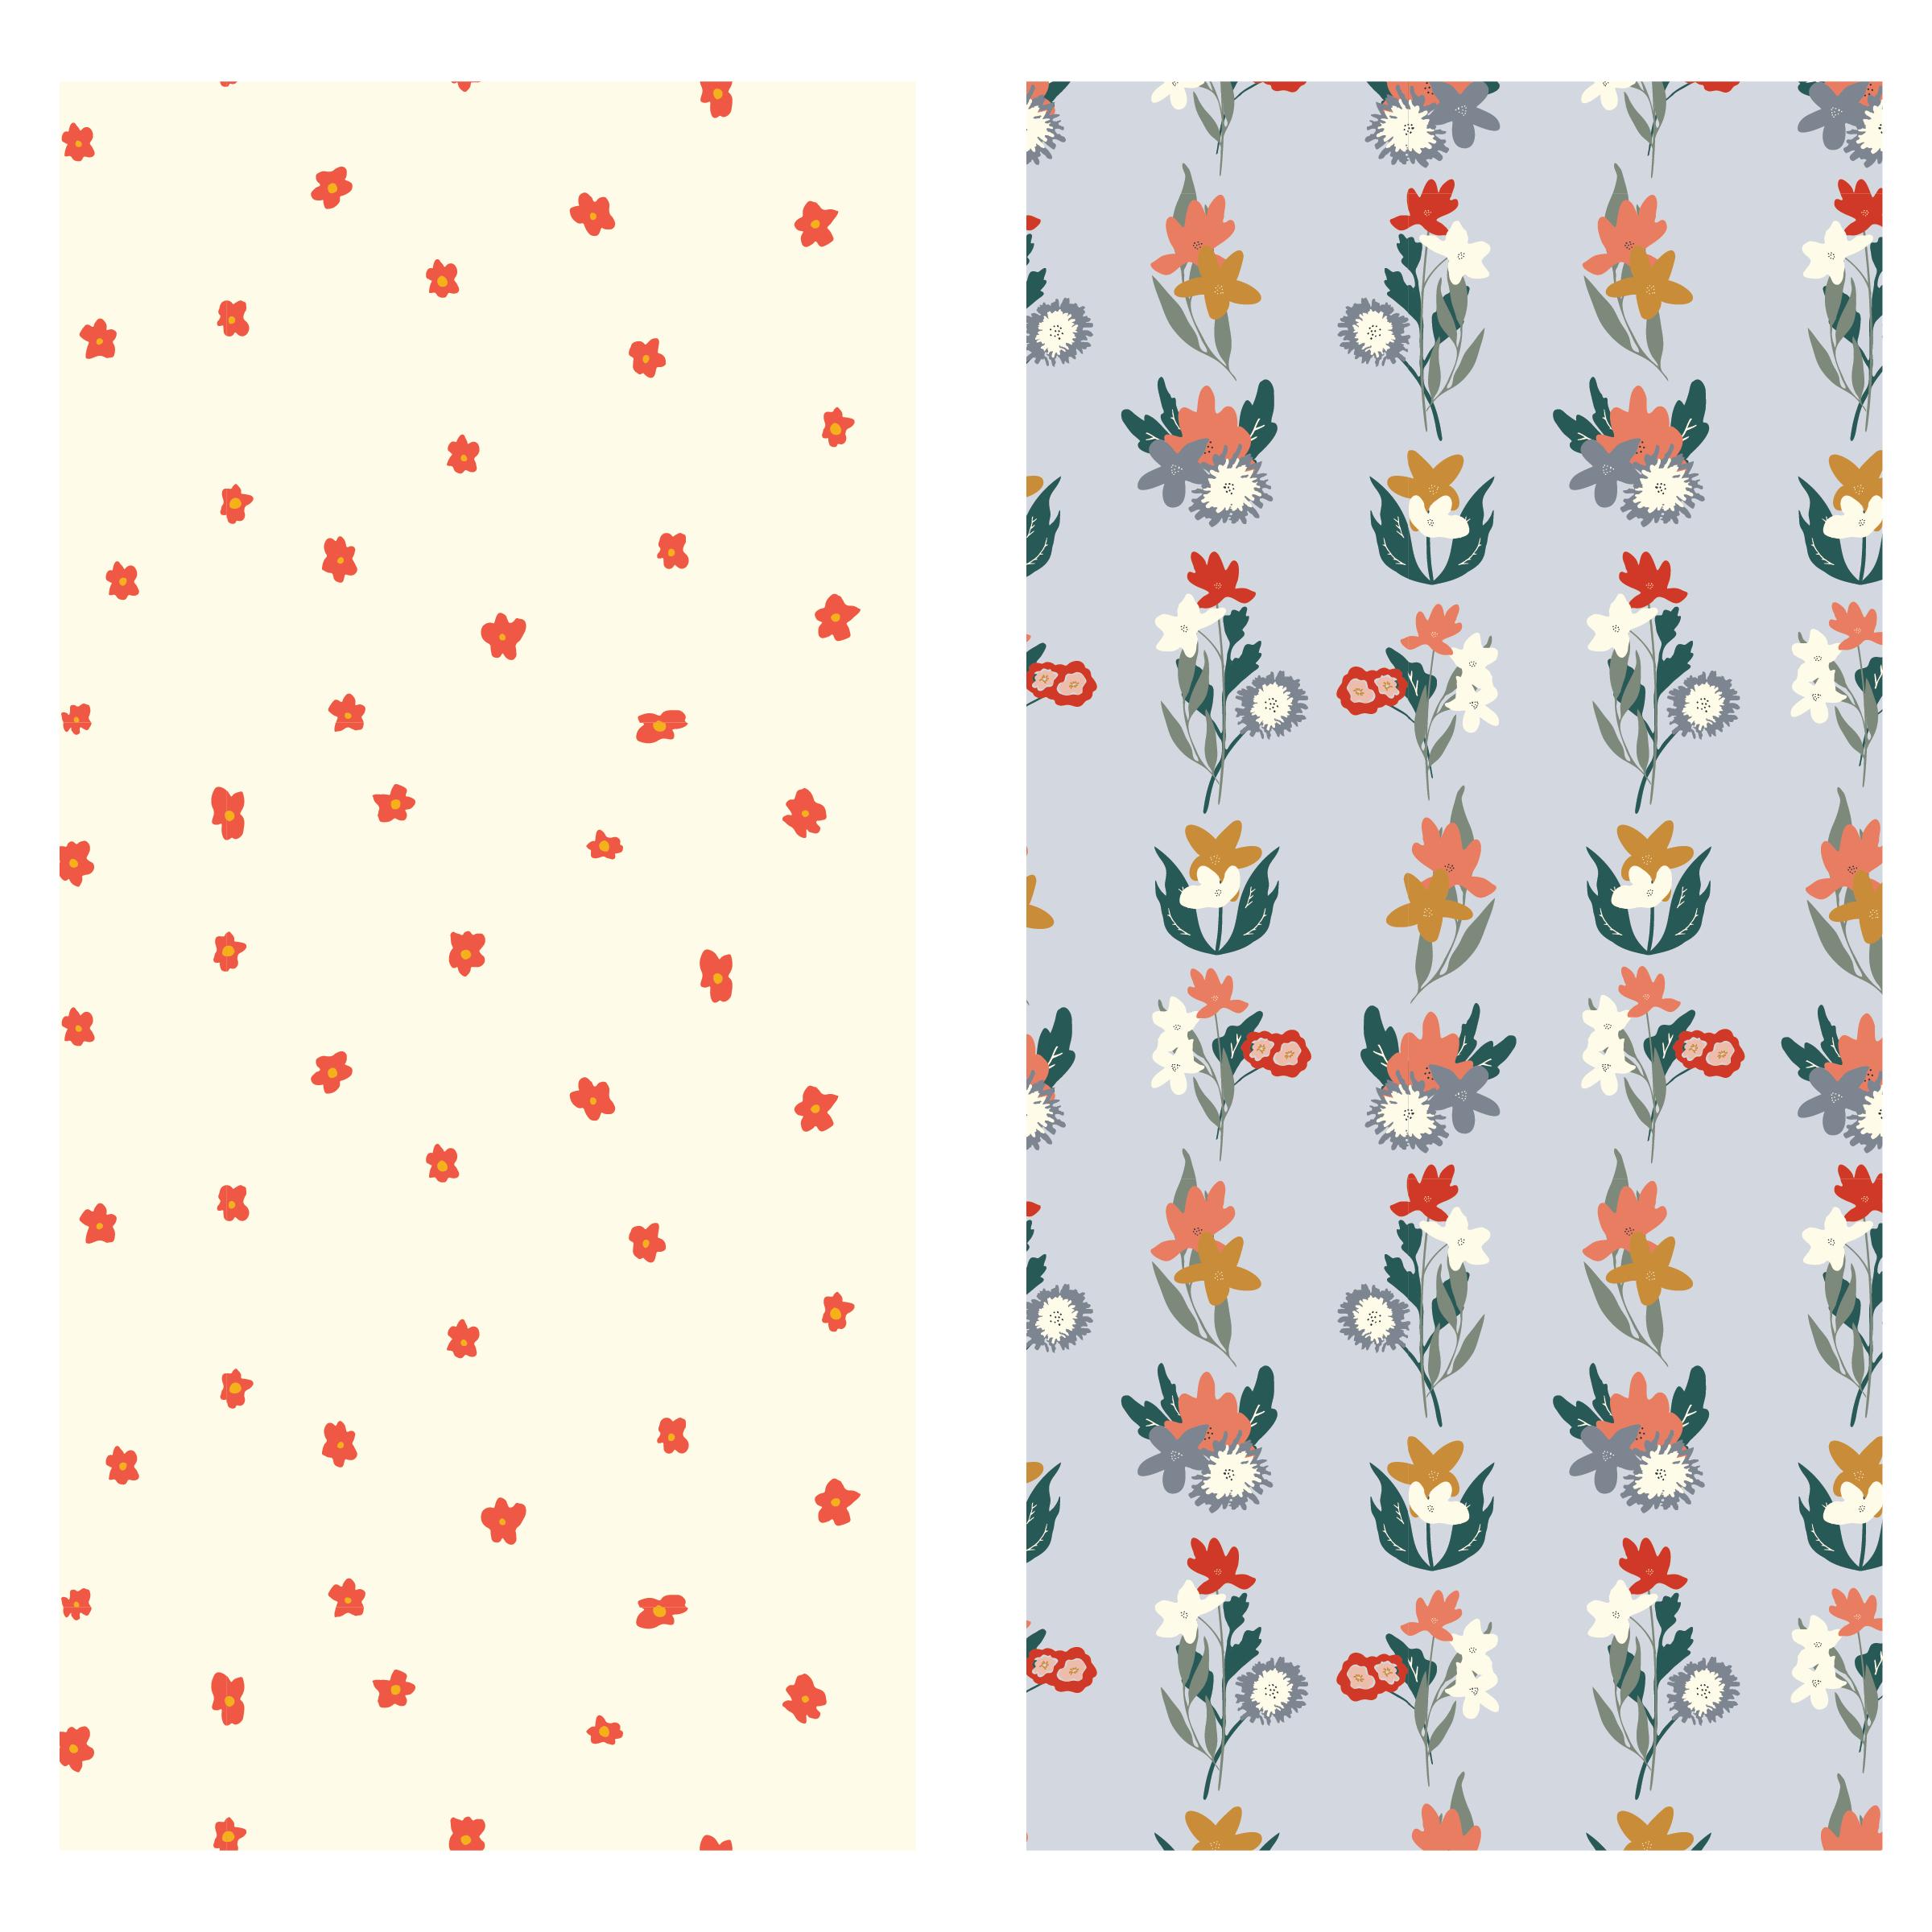 by HOPE johnson surface pattern design_pattern pair166.jpg